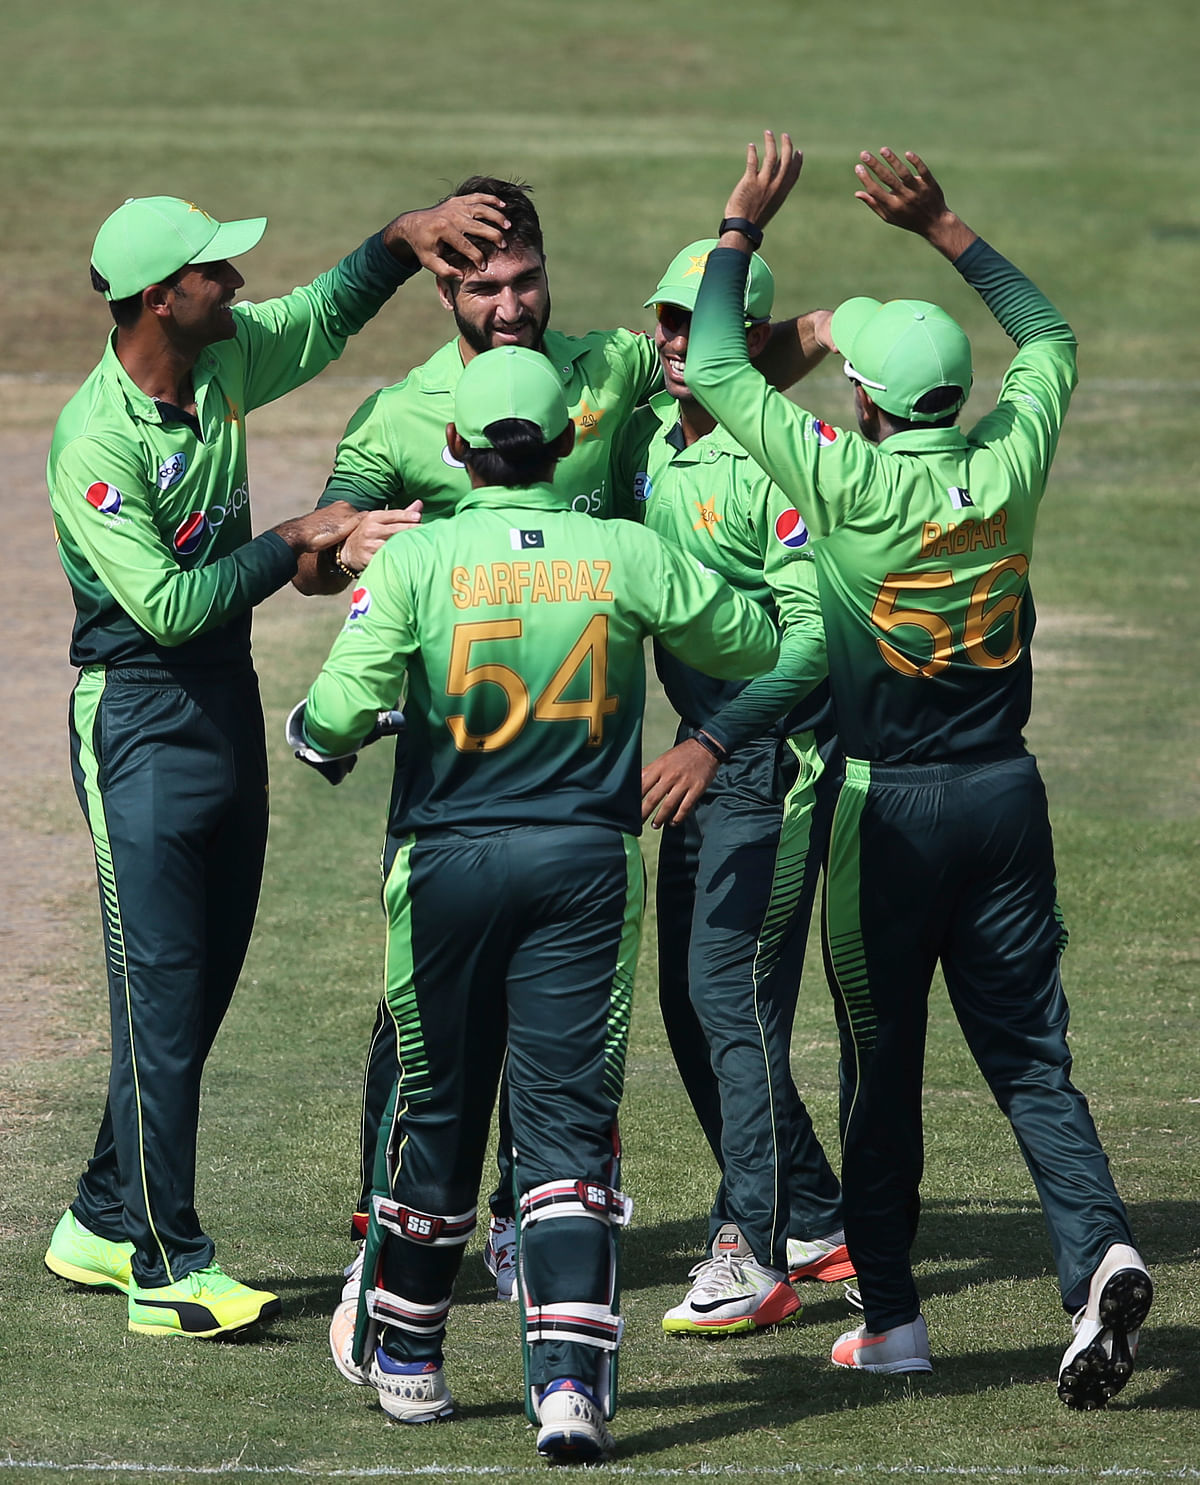 Pakistan's Usman Khan Shinwari celebrates the dismissal of Sri Lanka's Sadeera Samarawickrama with his teammates during their fifth ODI.<a></a>